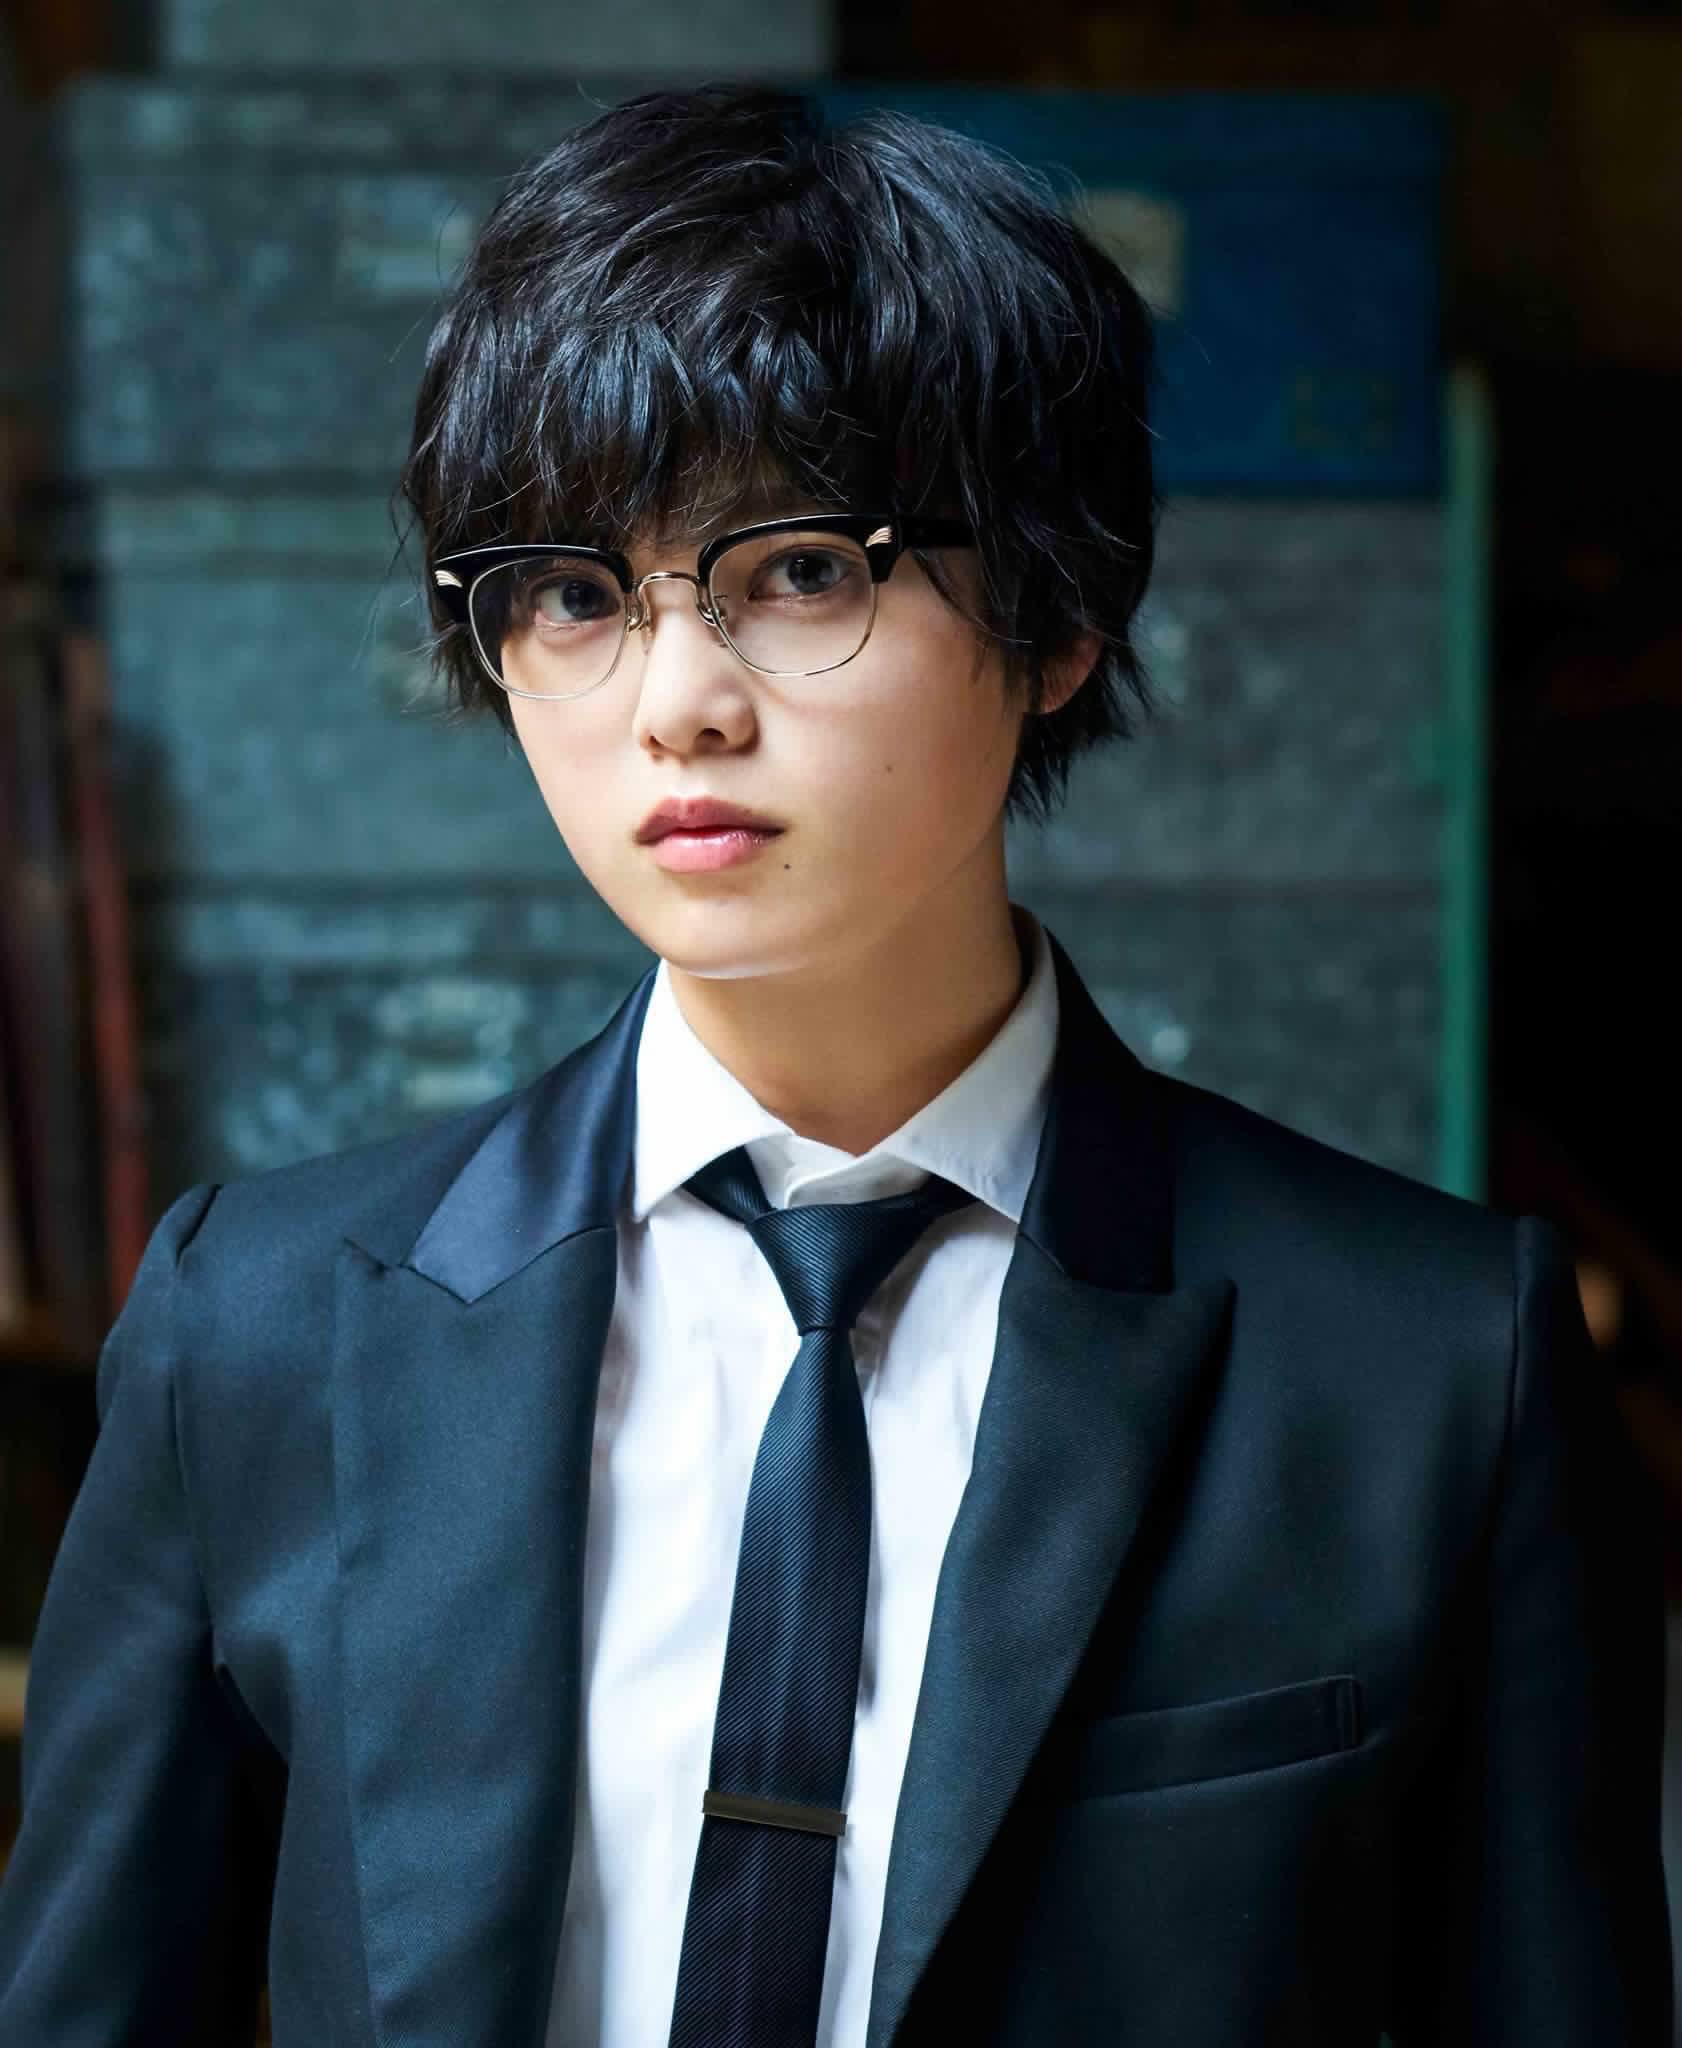 keyakizaka46 平手友梨奈 「風に吹かれても」